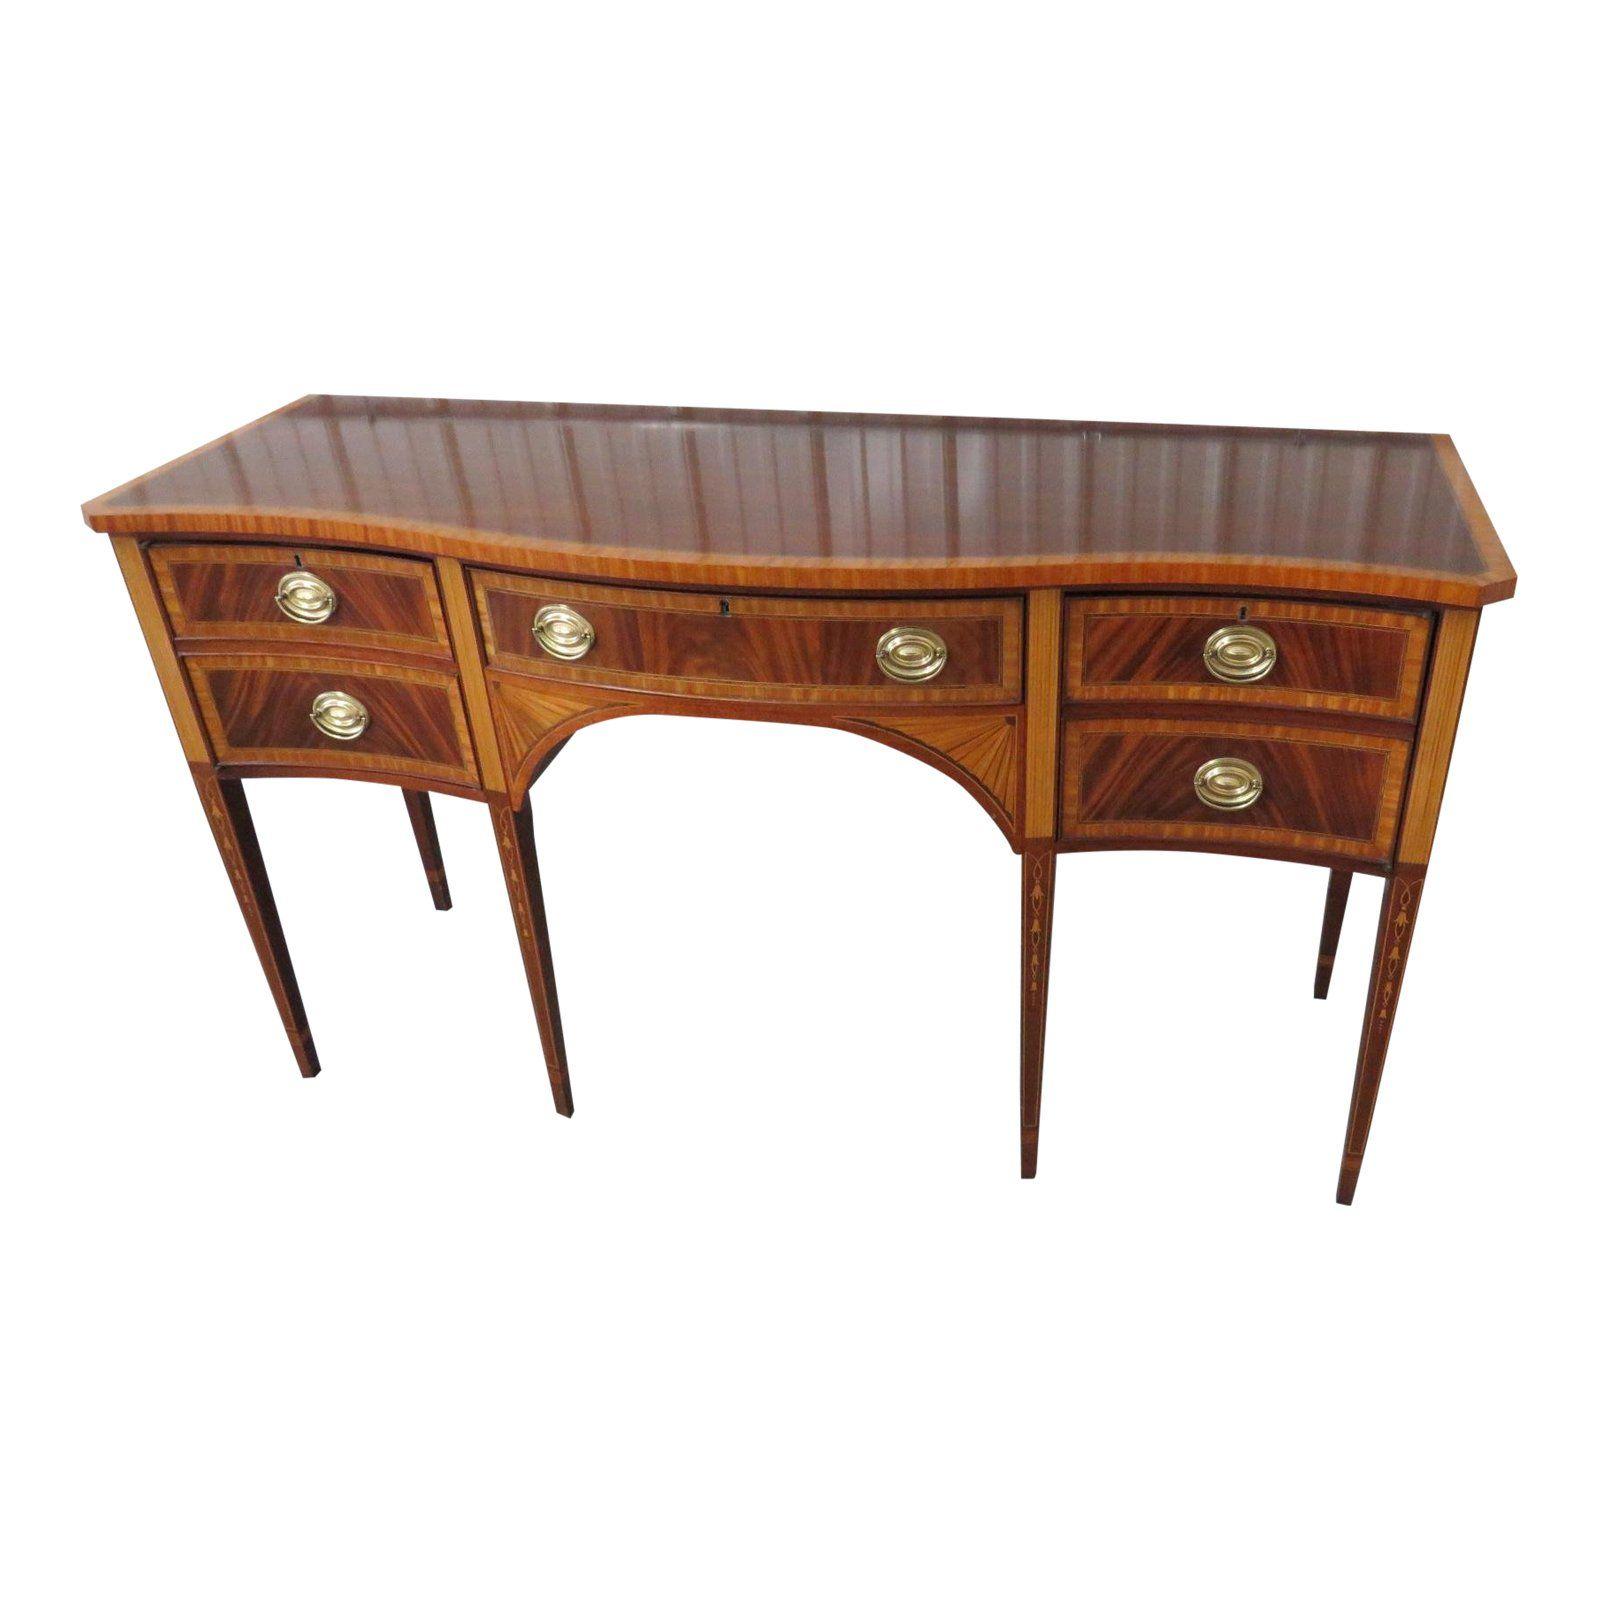 Councill Craftsman Georgian Style Sideboard Sideboard Furniture